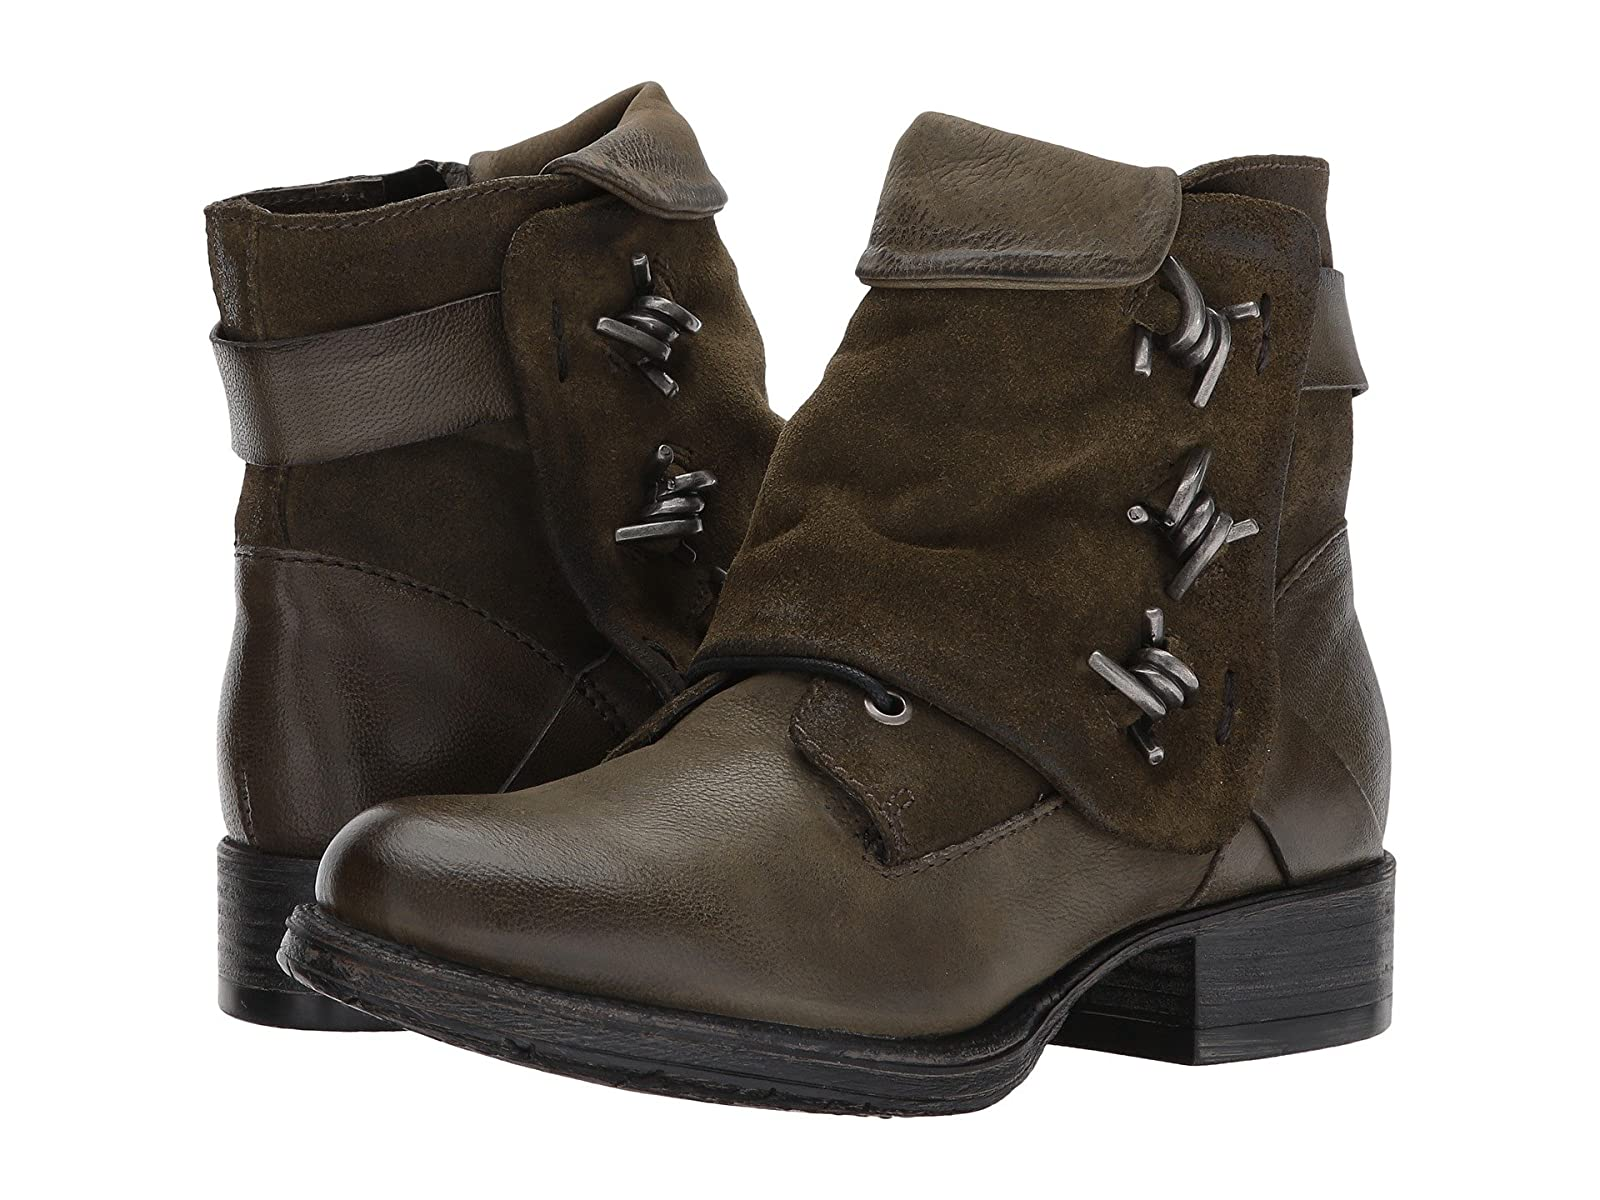 Miz Mooz NessCheap and distinctive eye-catching shoes